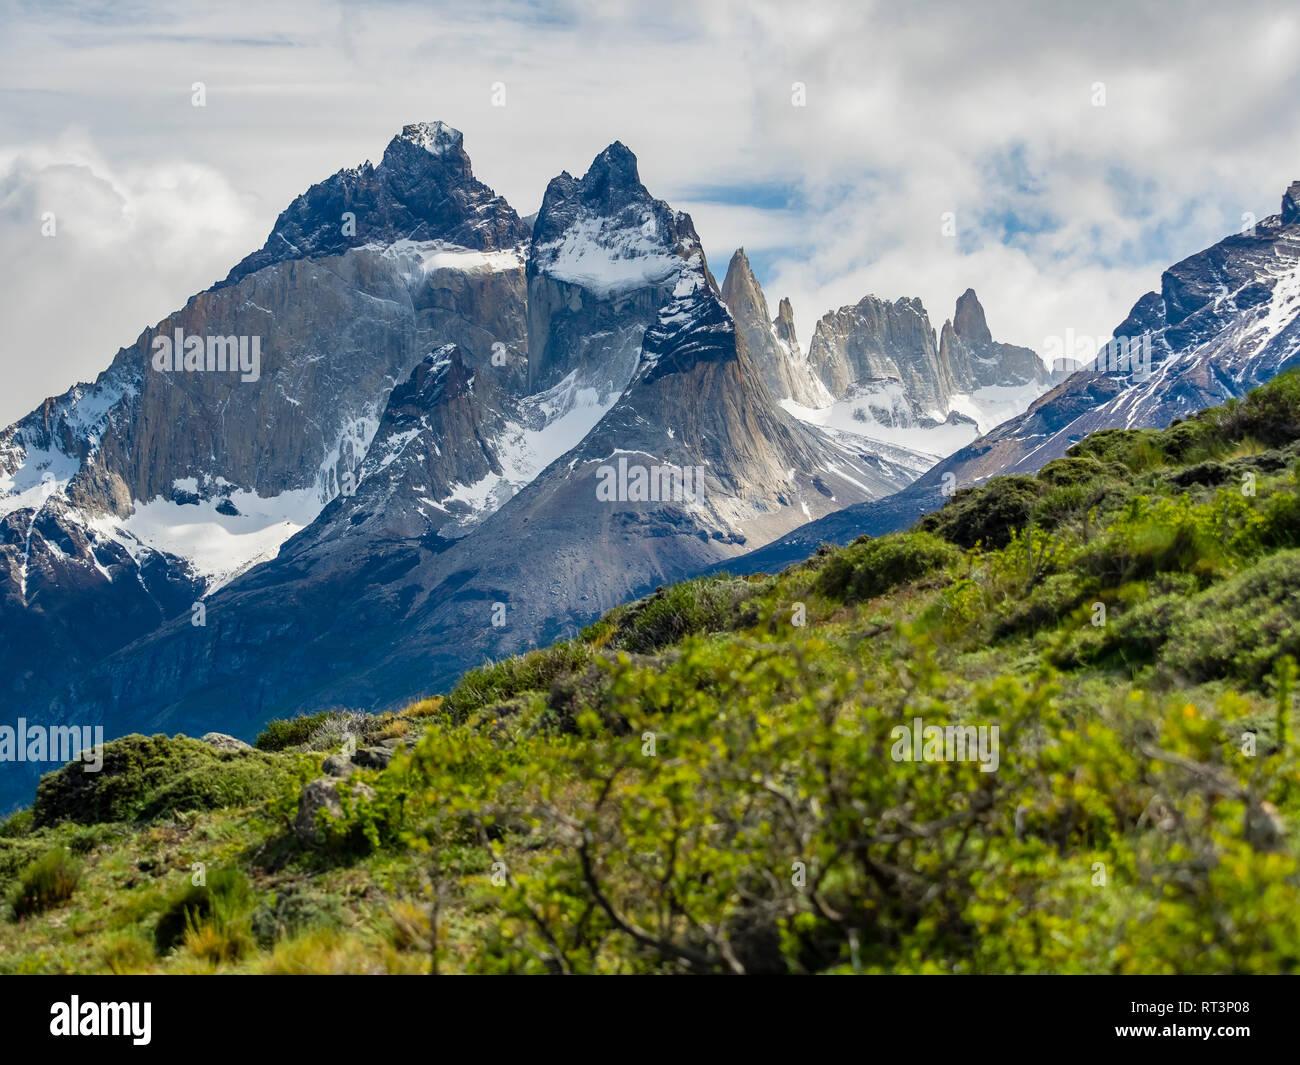 Chile, Patagonia, Torres del Paine National Park, Cerro Paine Grande and  Torres del Paine - Stock Image